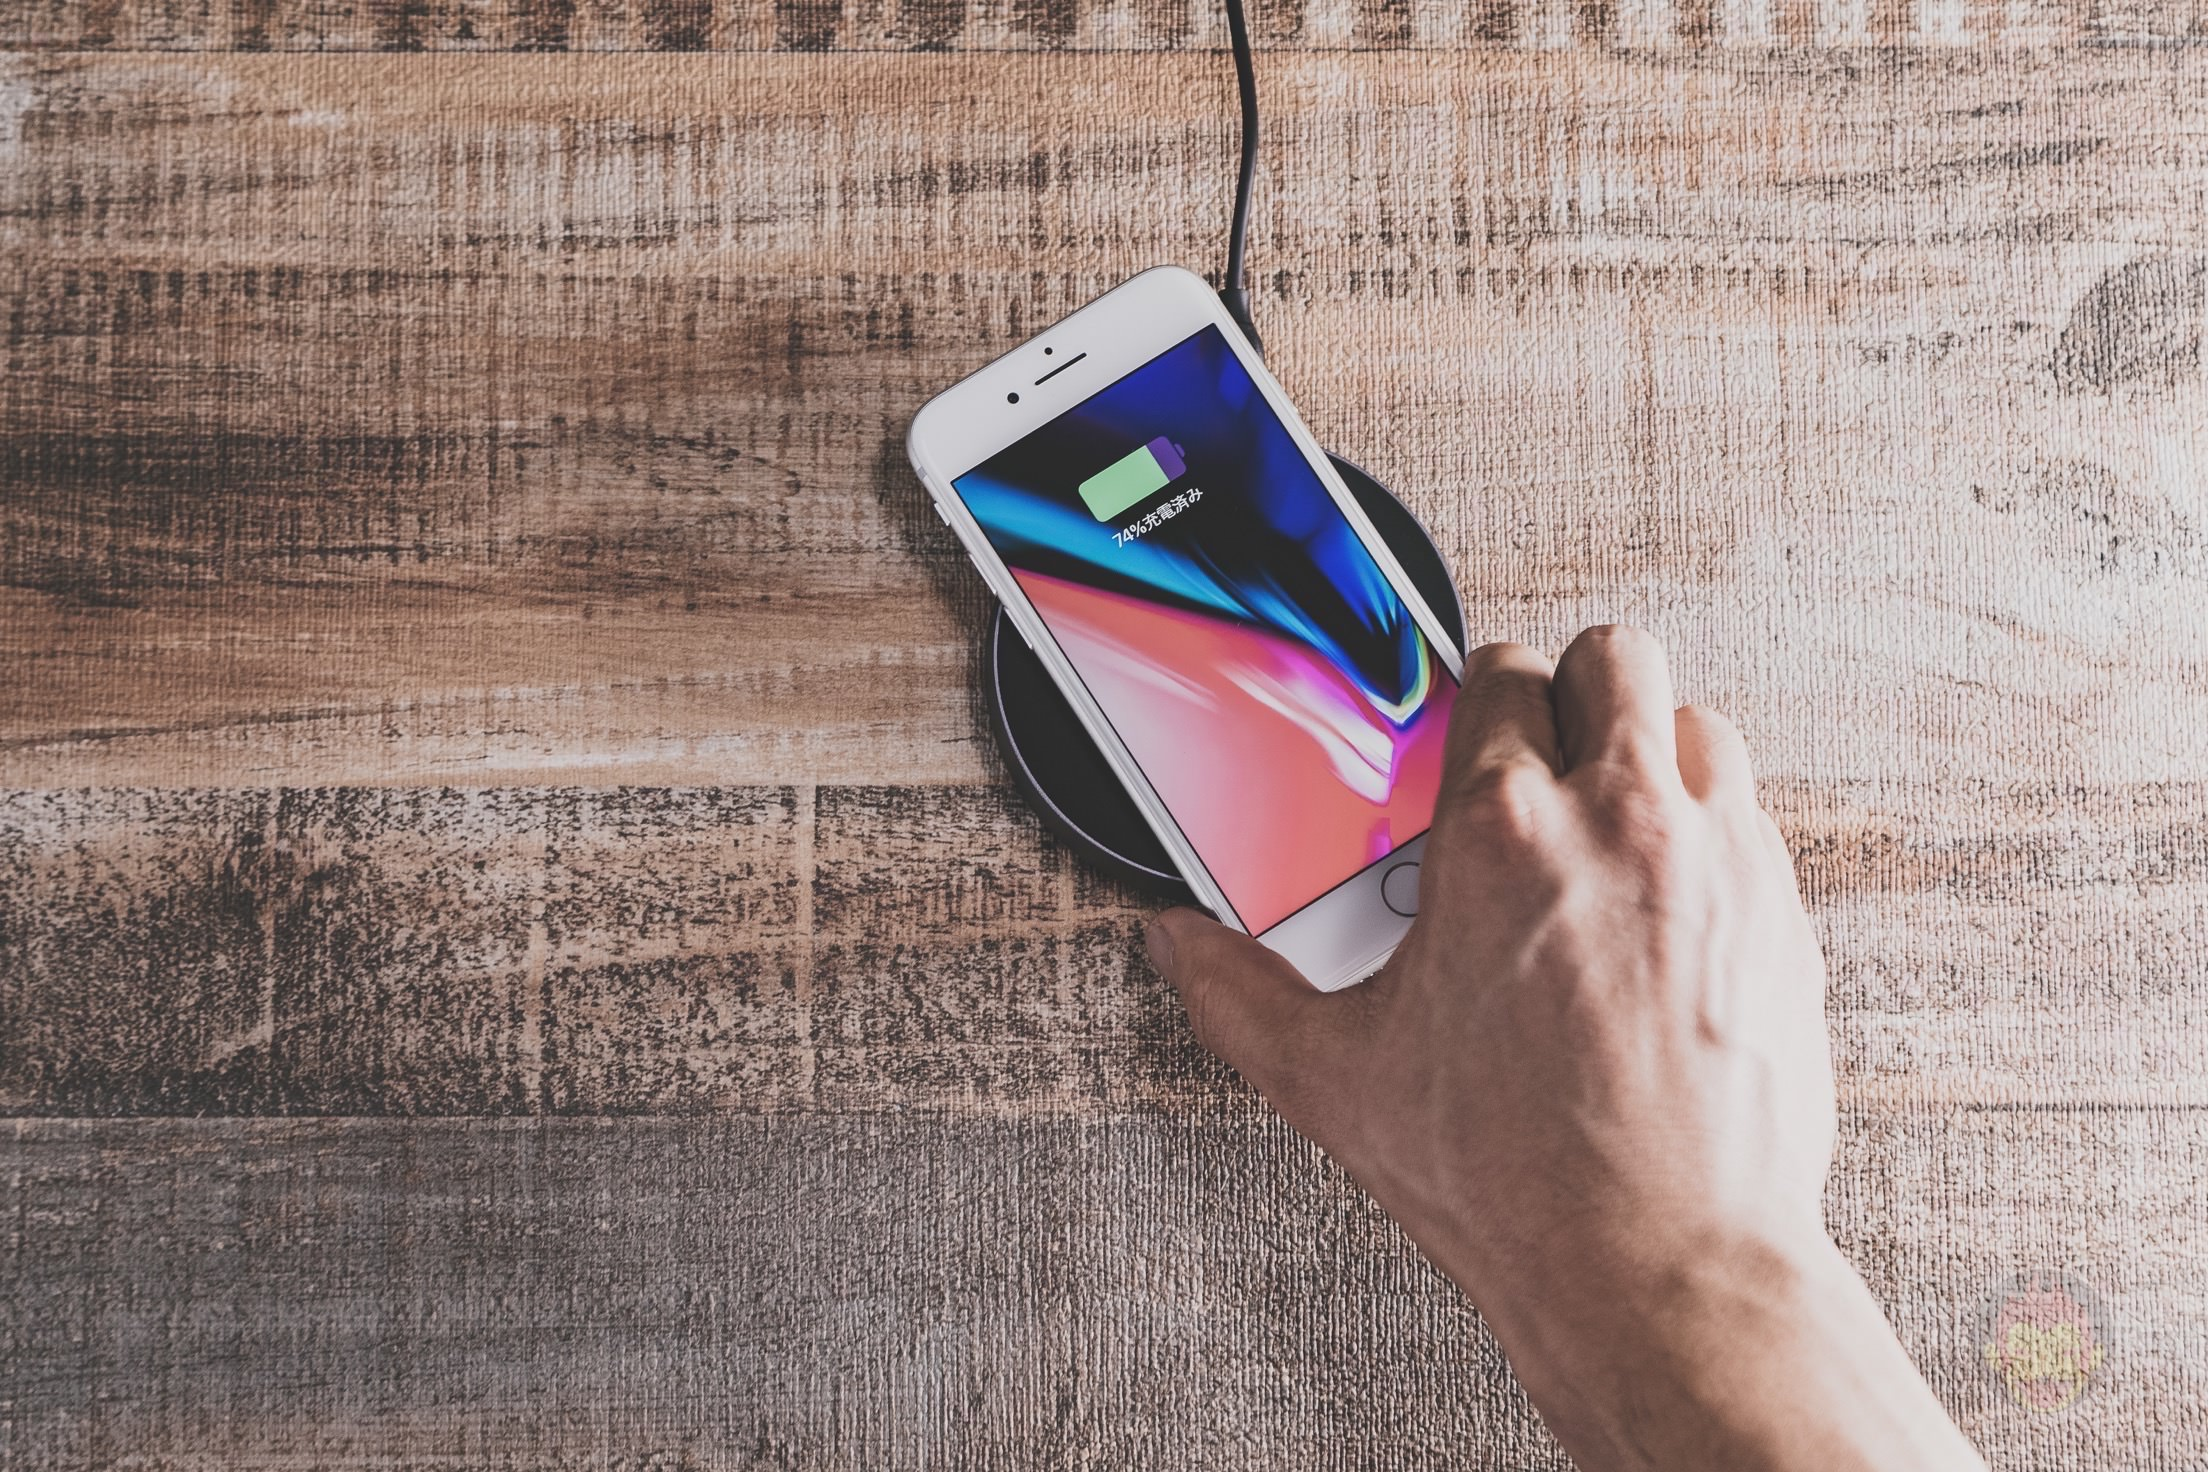 iPhone8-8Plus-Review-42.jpg